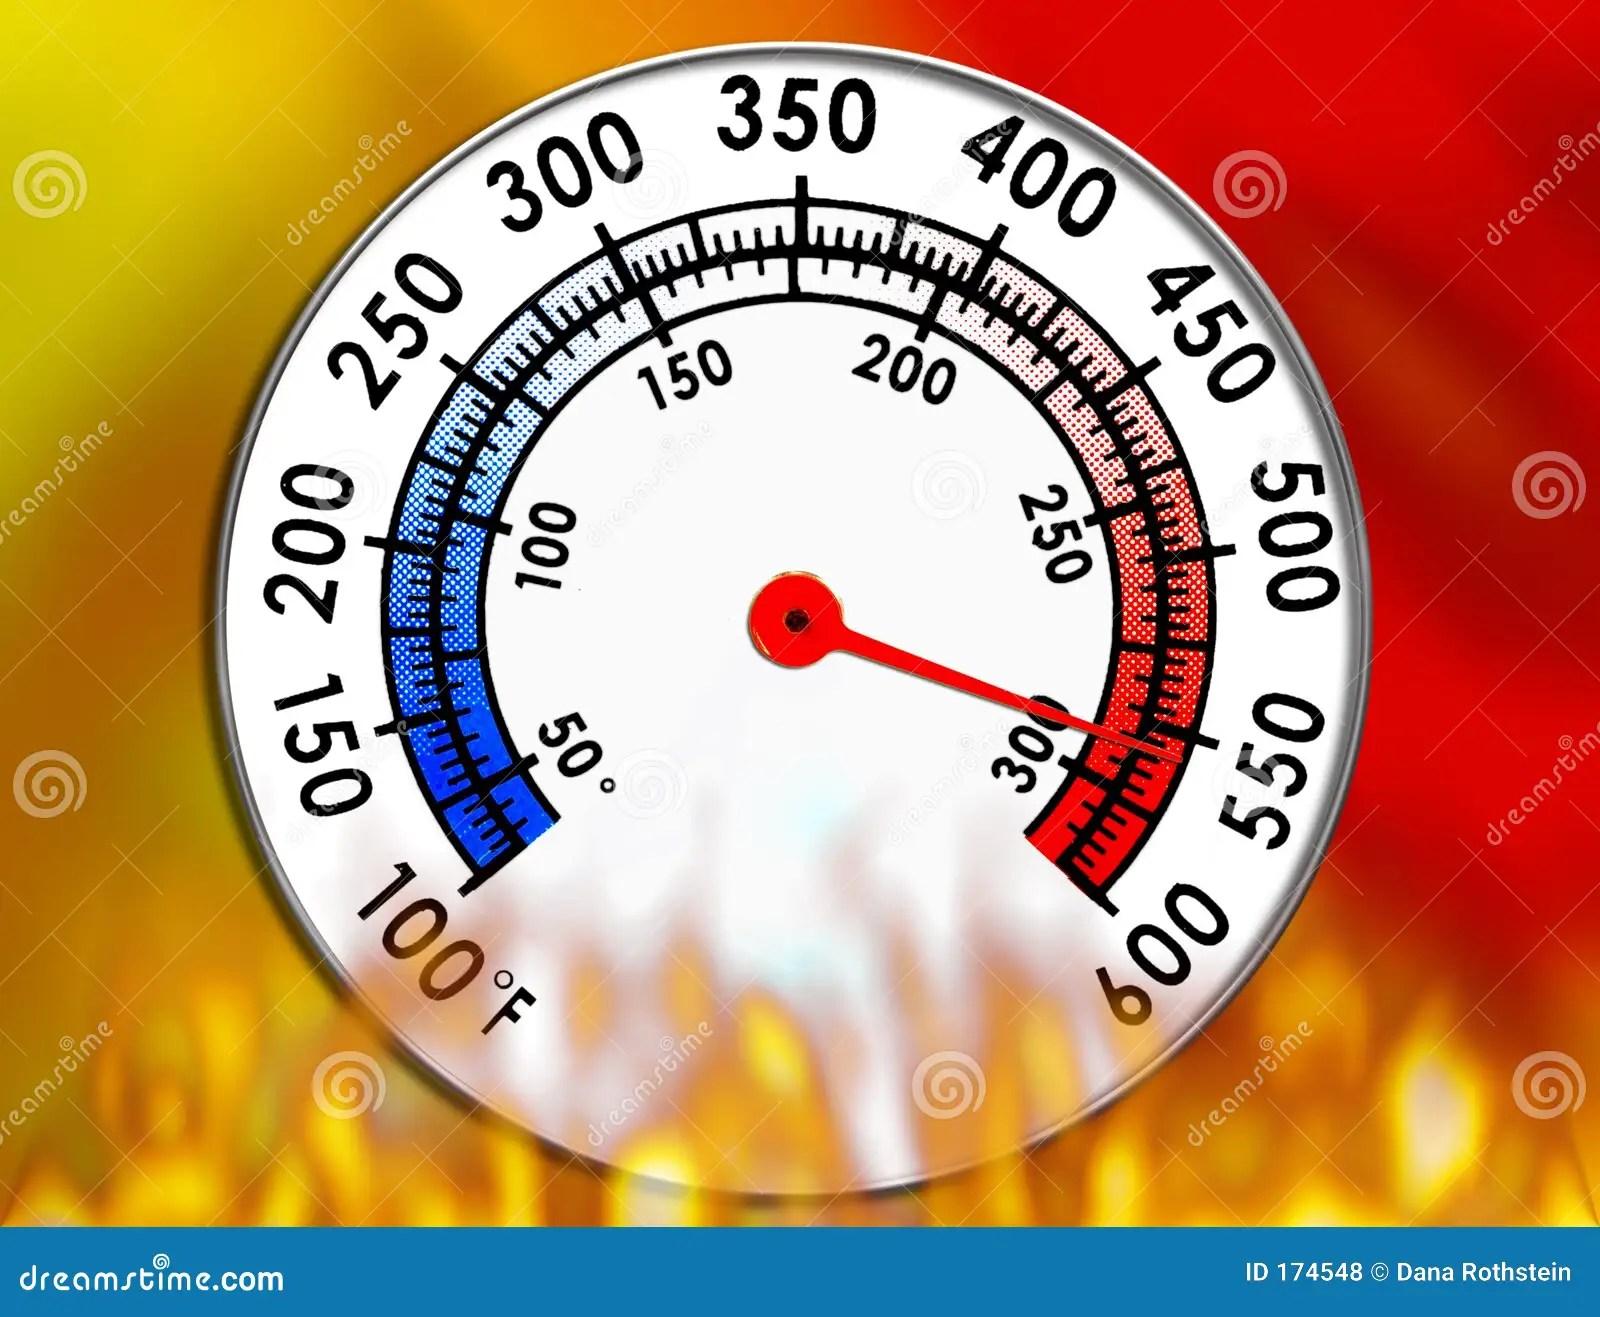 Temperature Gauge Stock Photo Image Of Science Measure